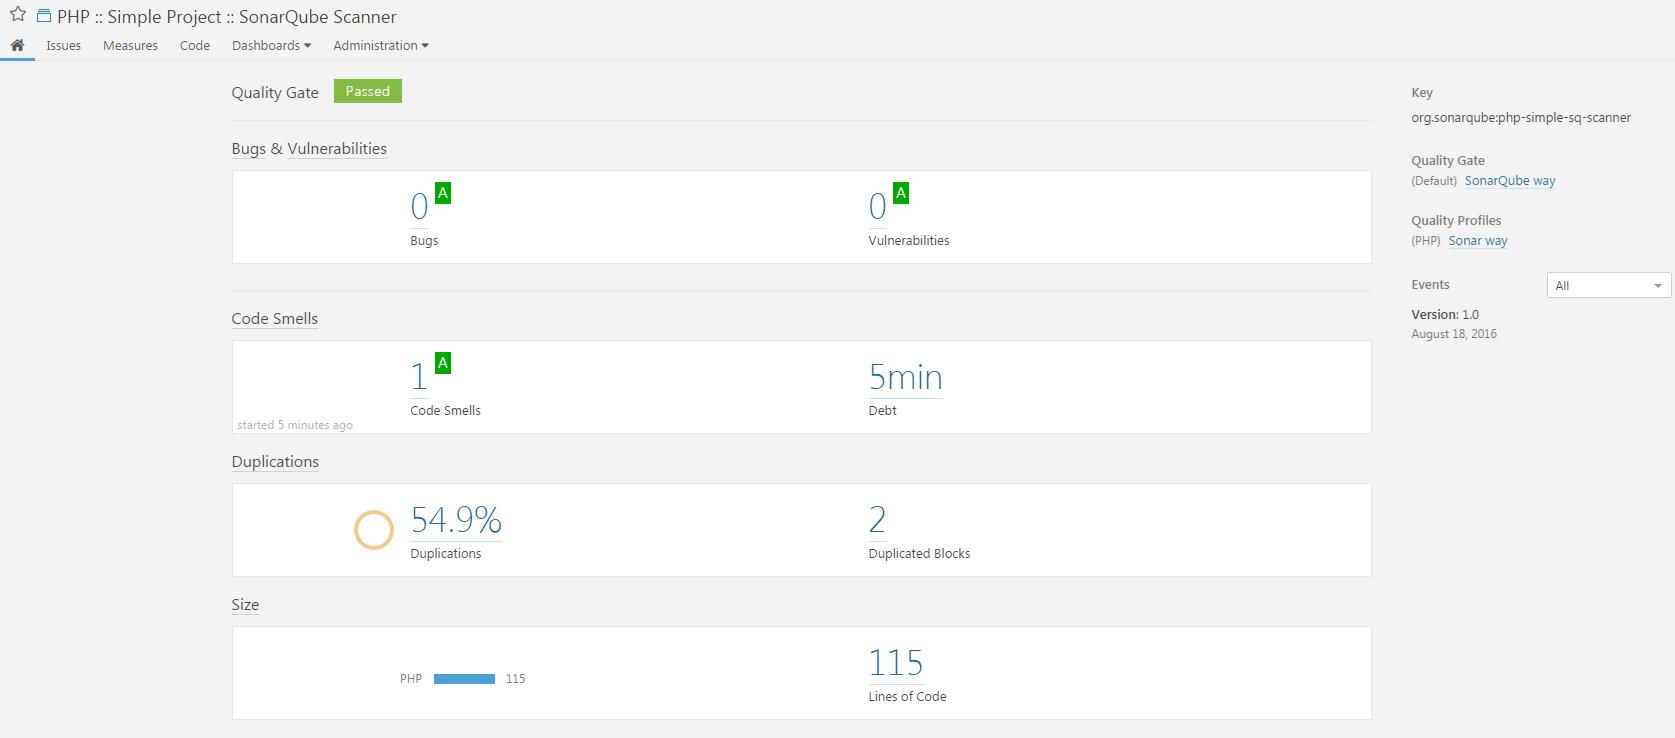 SonarQube-Scanner-PHP-Result